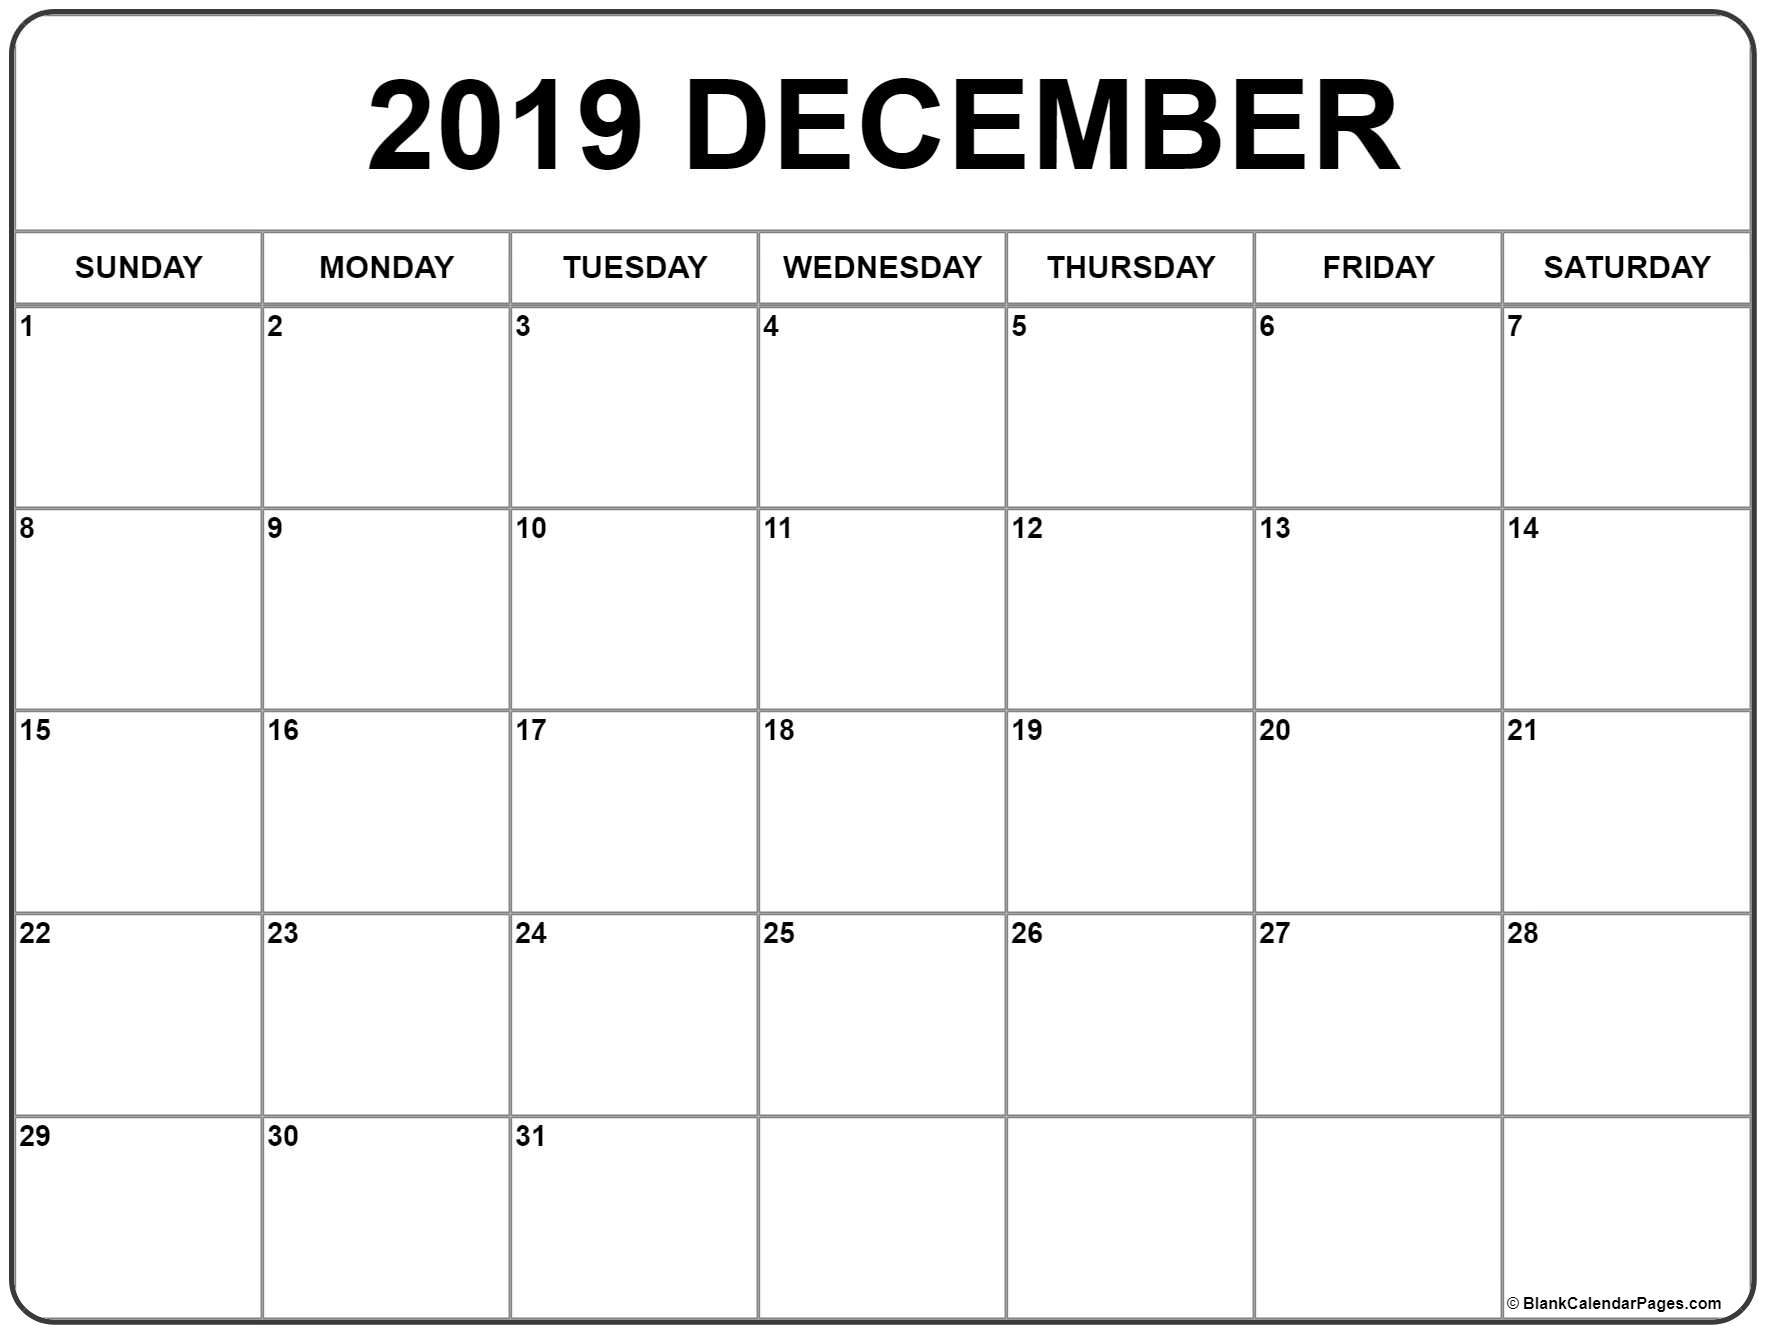 December 2019 Printable Calendar - Free Blank Templates